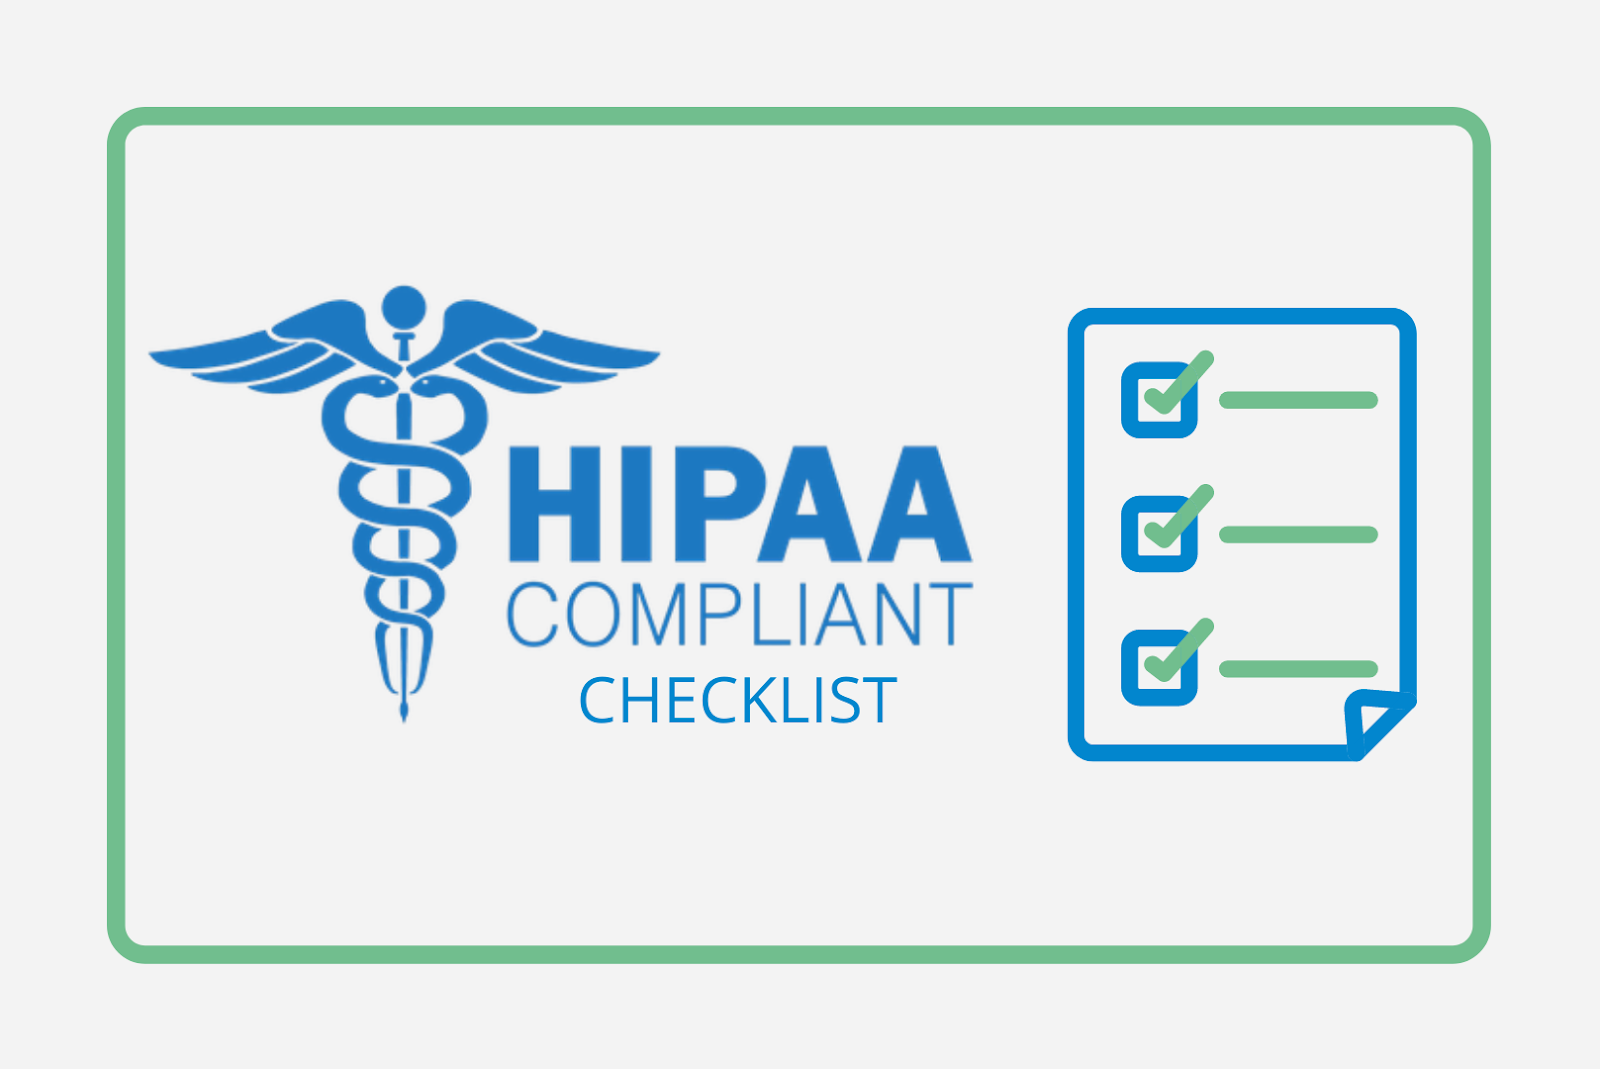 HIPAA Complaint Checklist